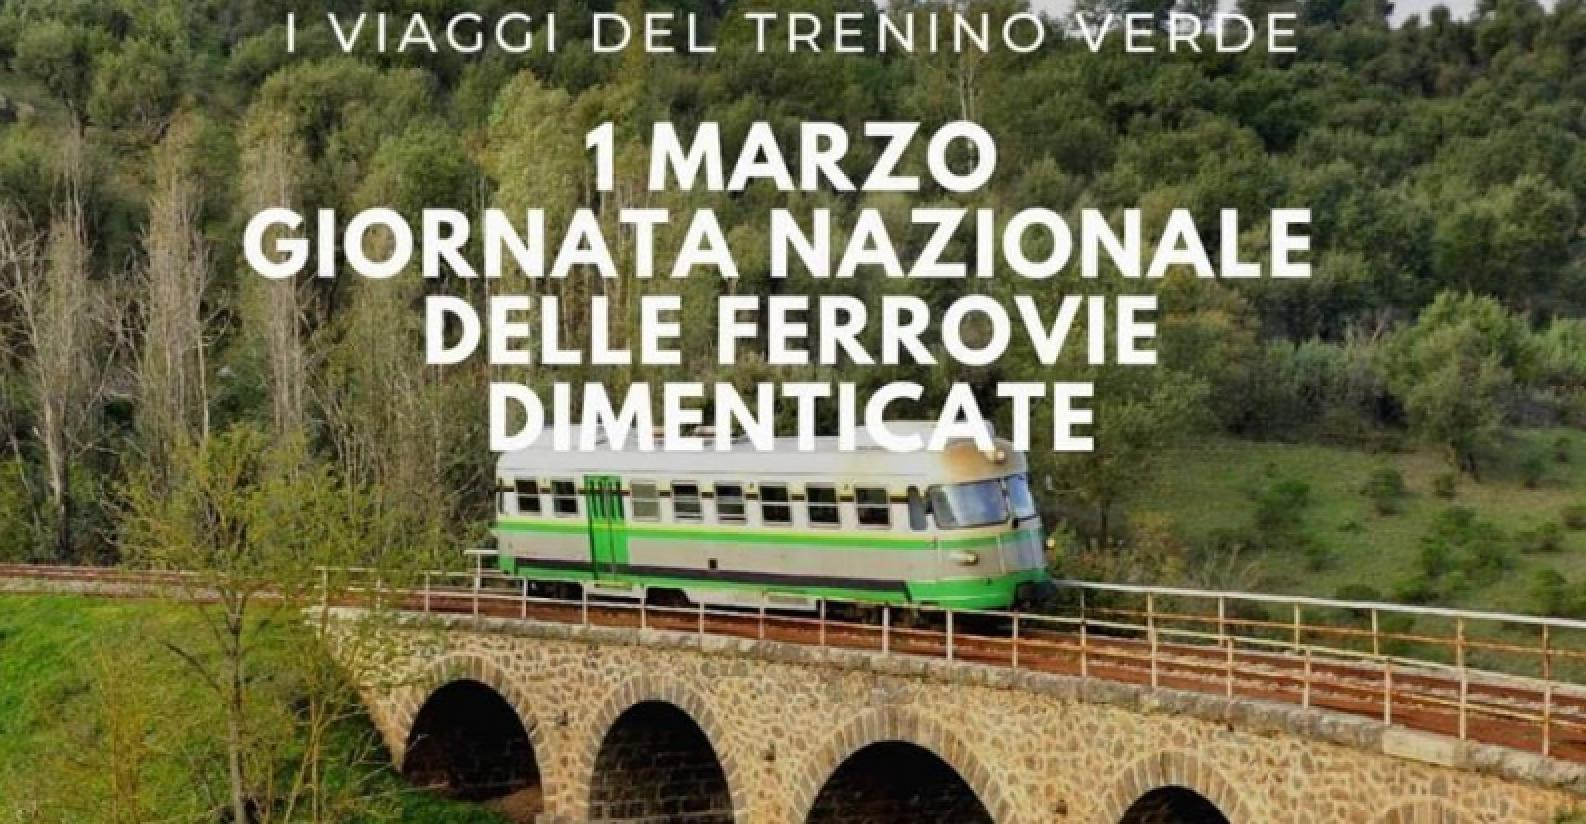 gironata_ferrovie_dimenticate_1_marzo_2020_0